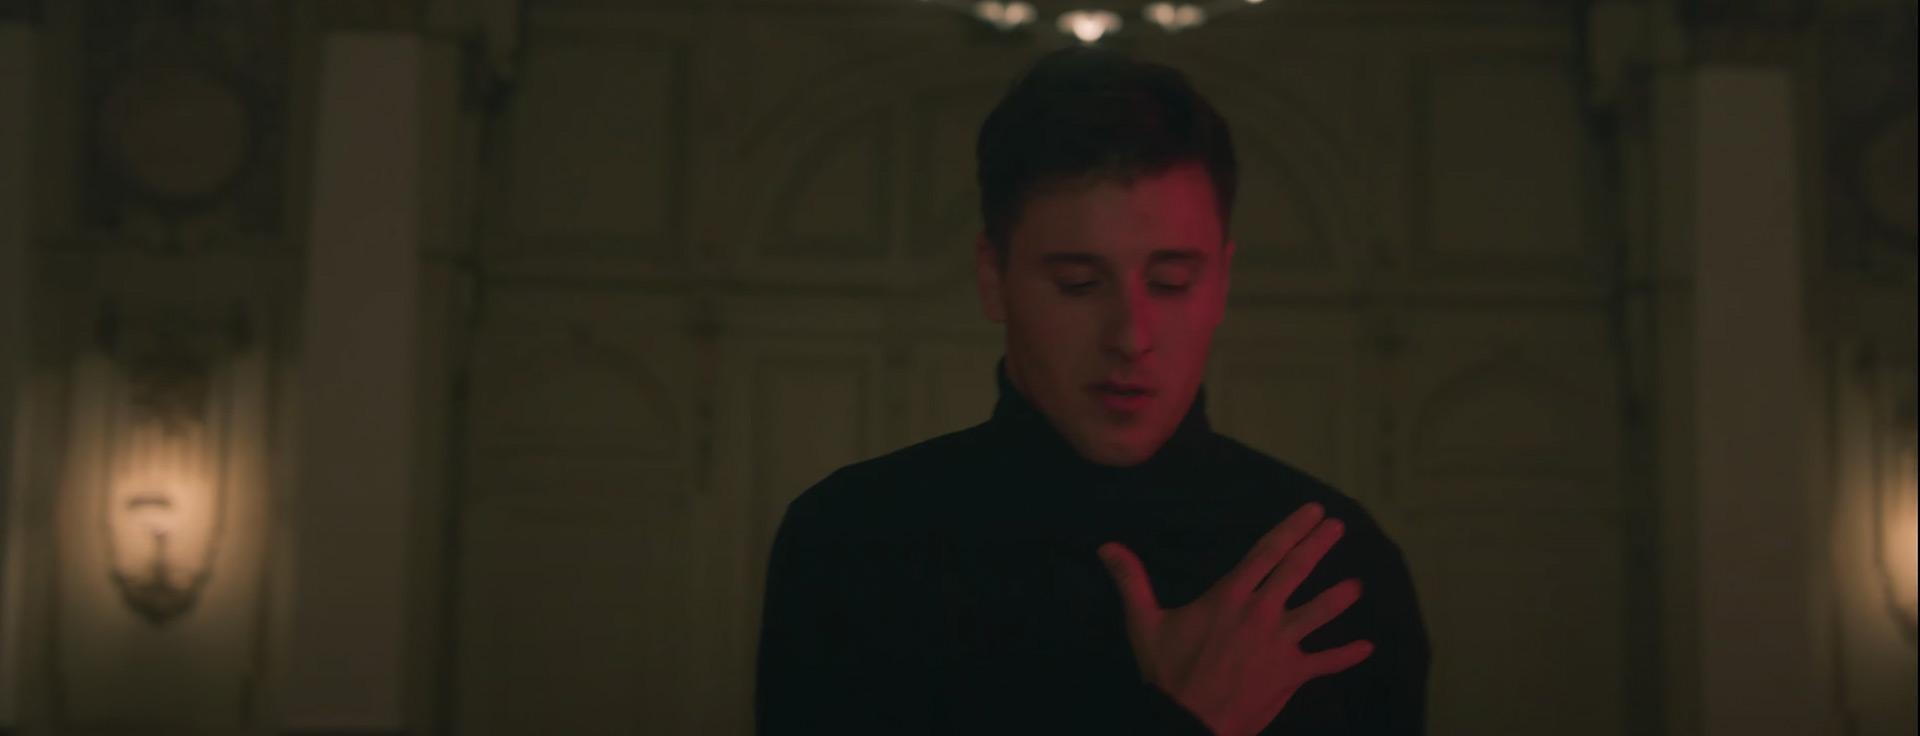 "Standbild Musikvideo ""Too far away"""